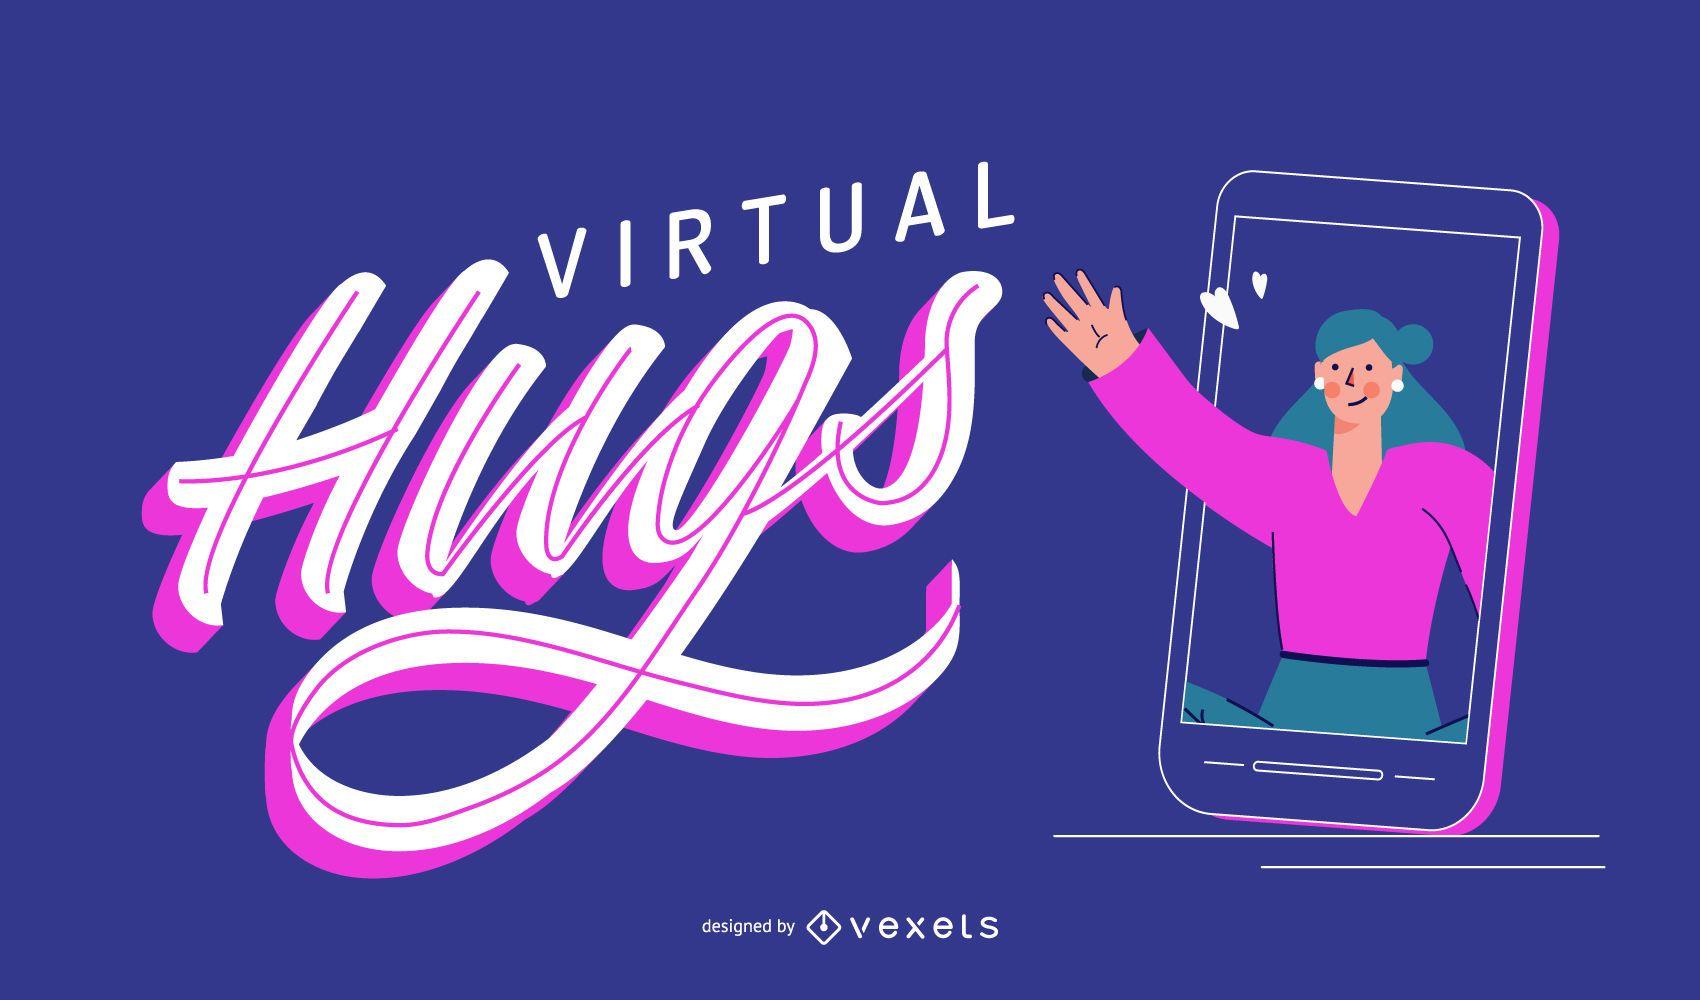 Abrazos virtuales Letras de Coronavirus